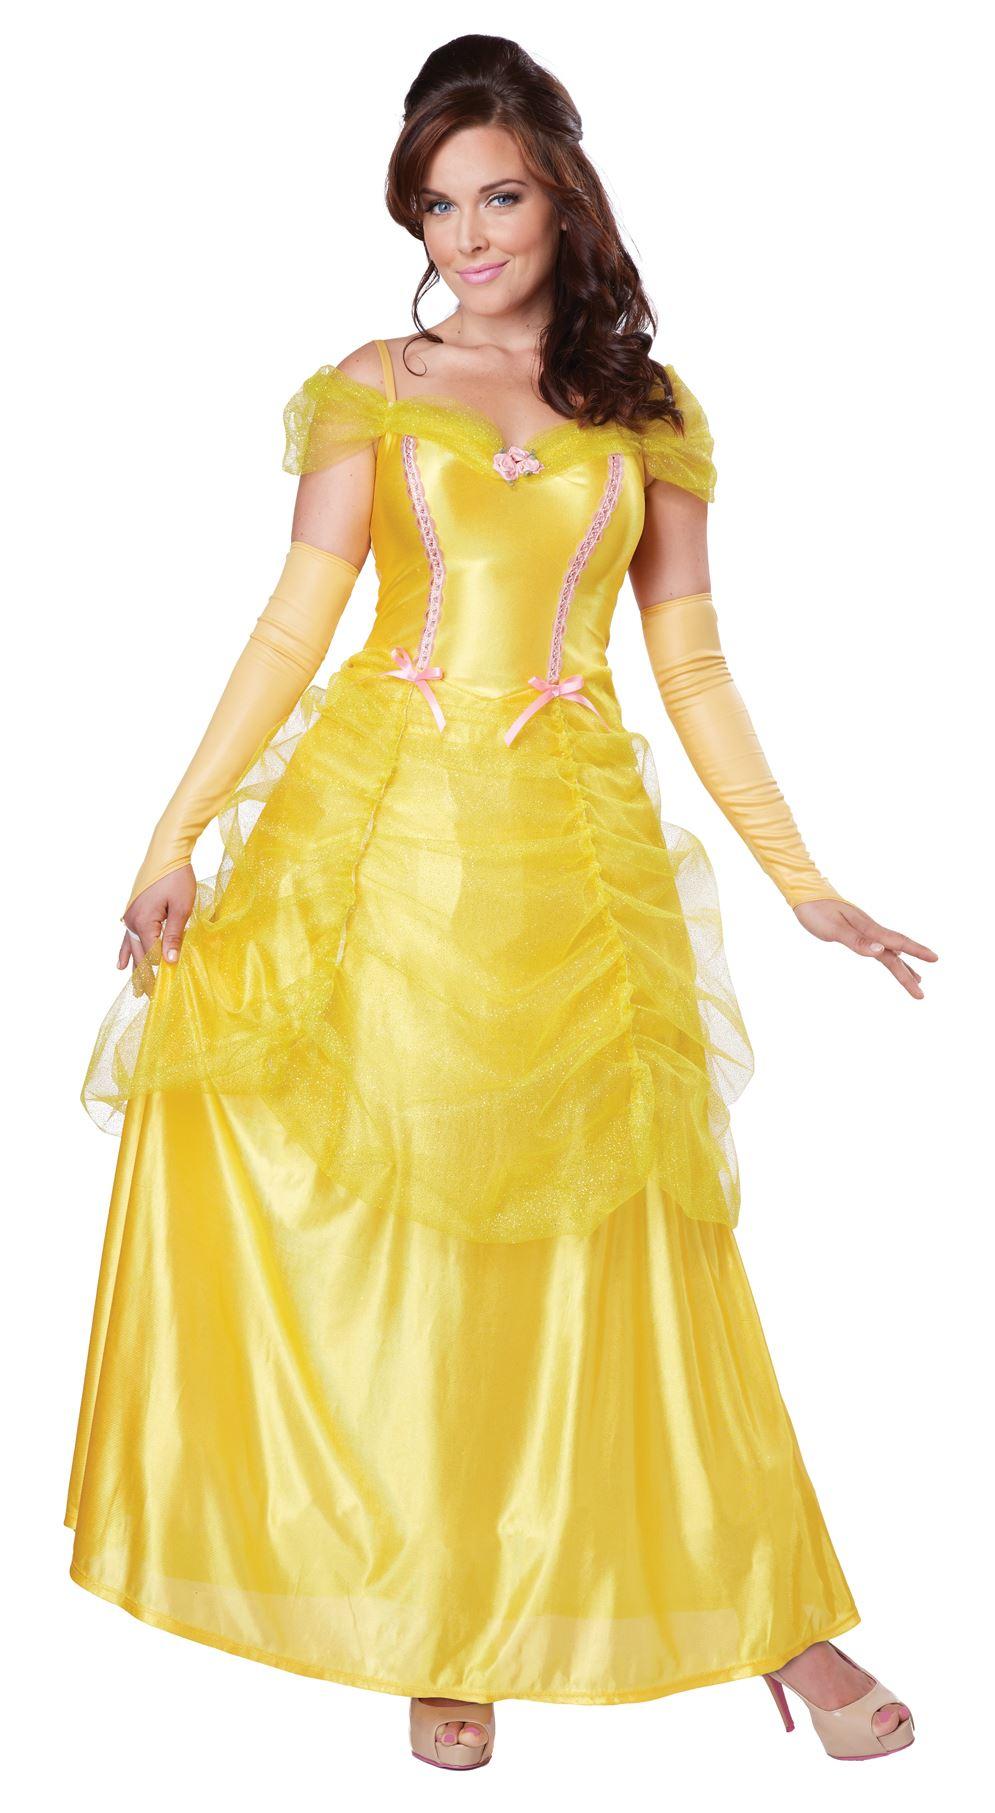 Clic Beauty Woman Fairy Tales Costume